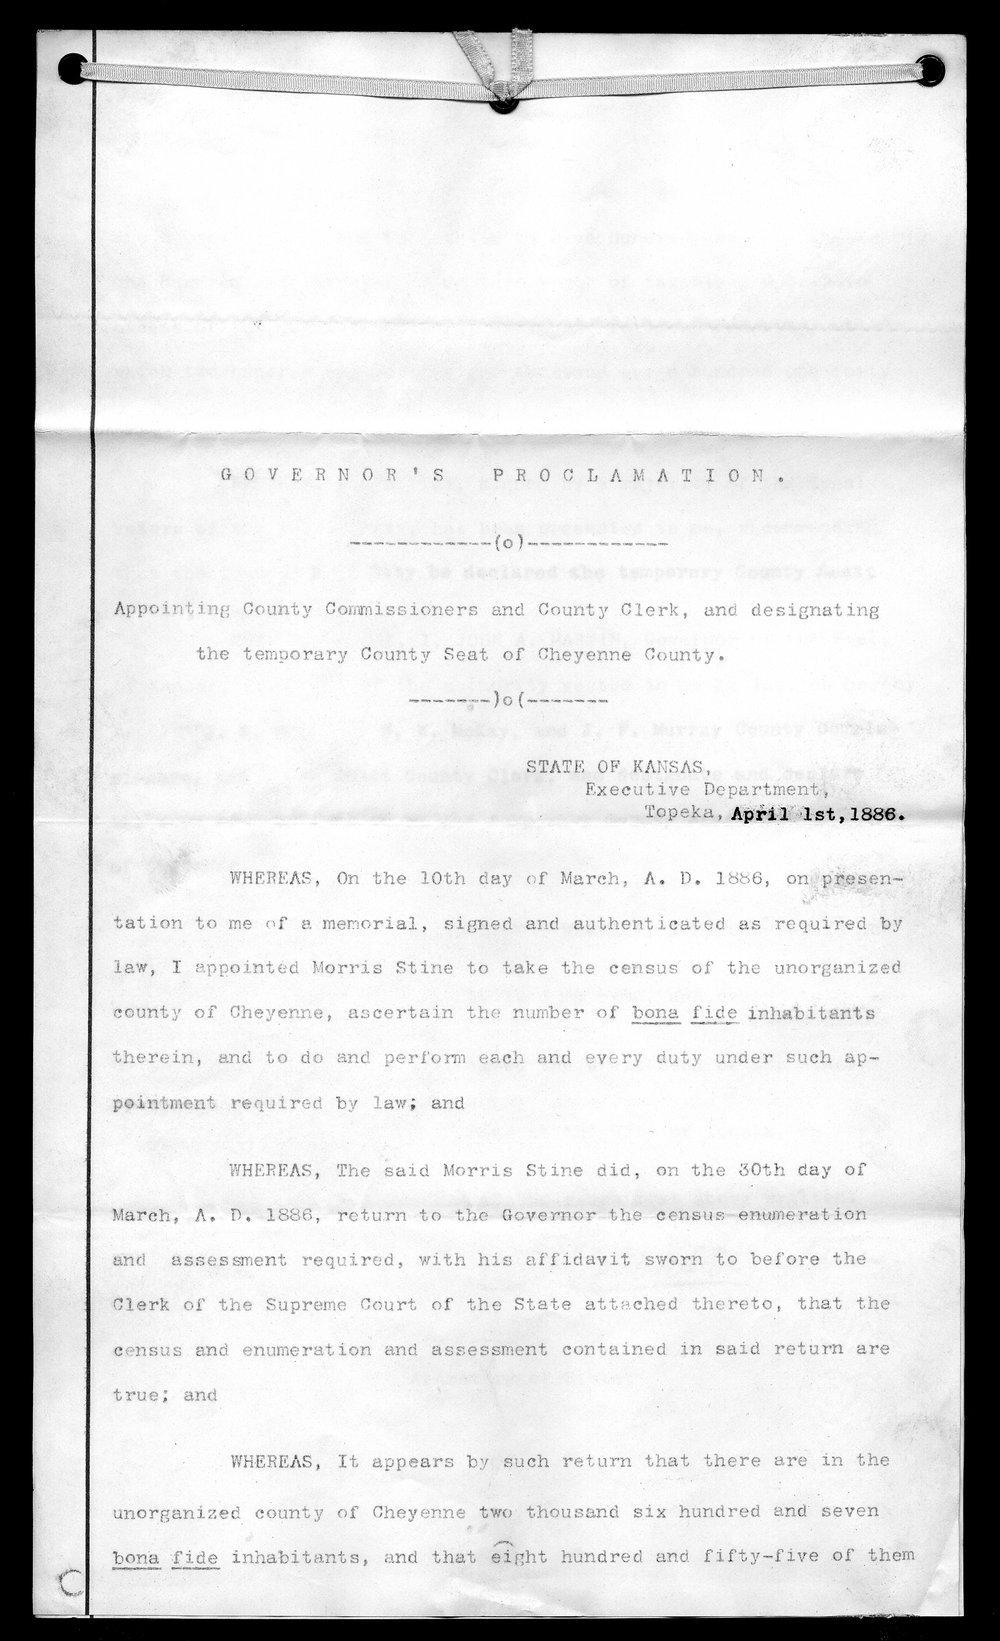 Cheyenne County organization records - 1